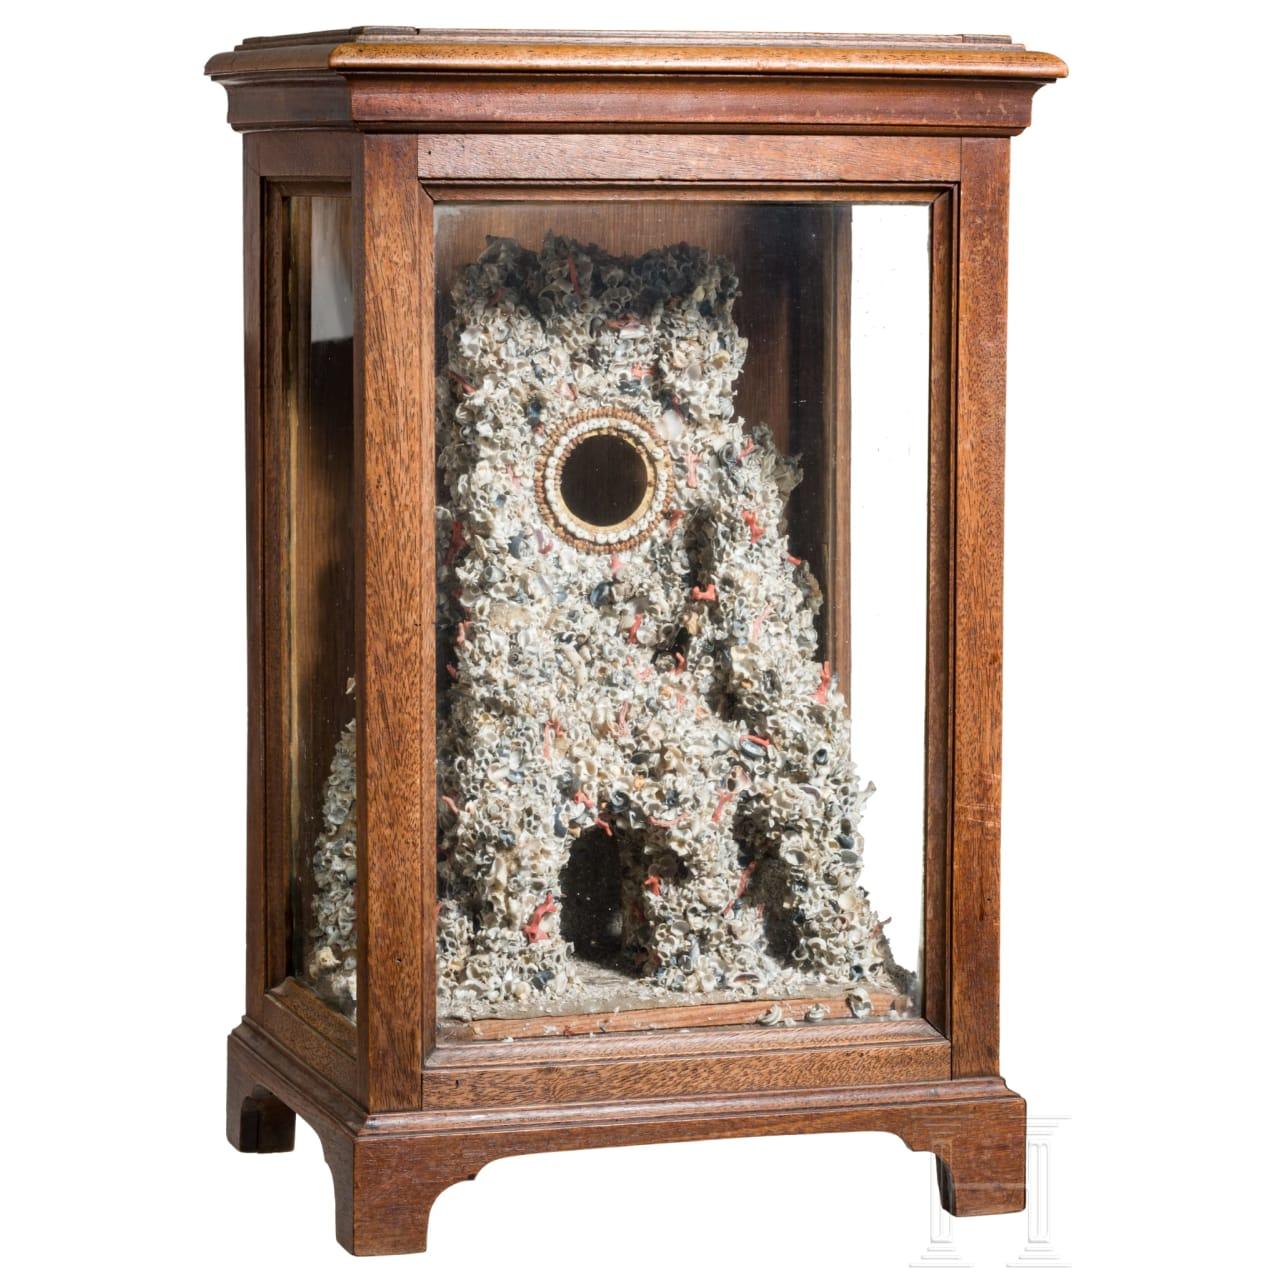 An extraordinary Italian pocket watch stand, Trapani, 19th century